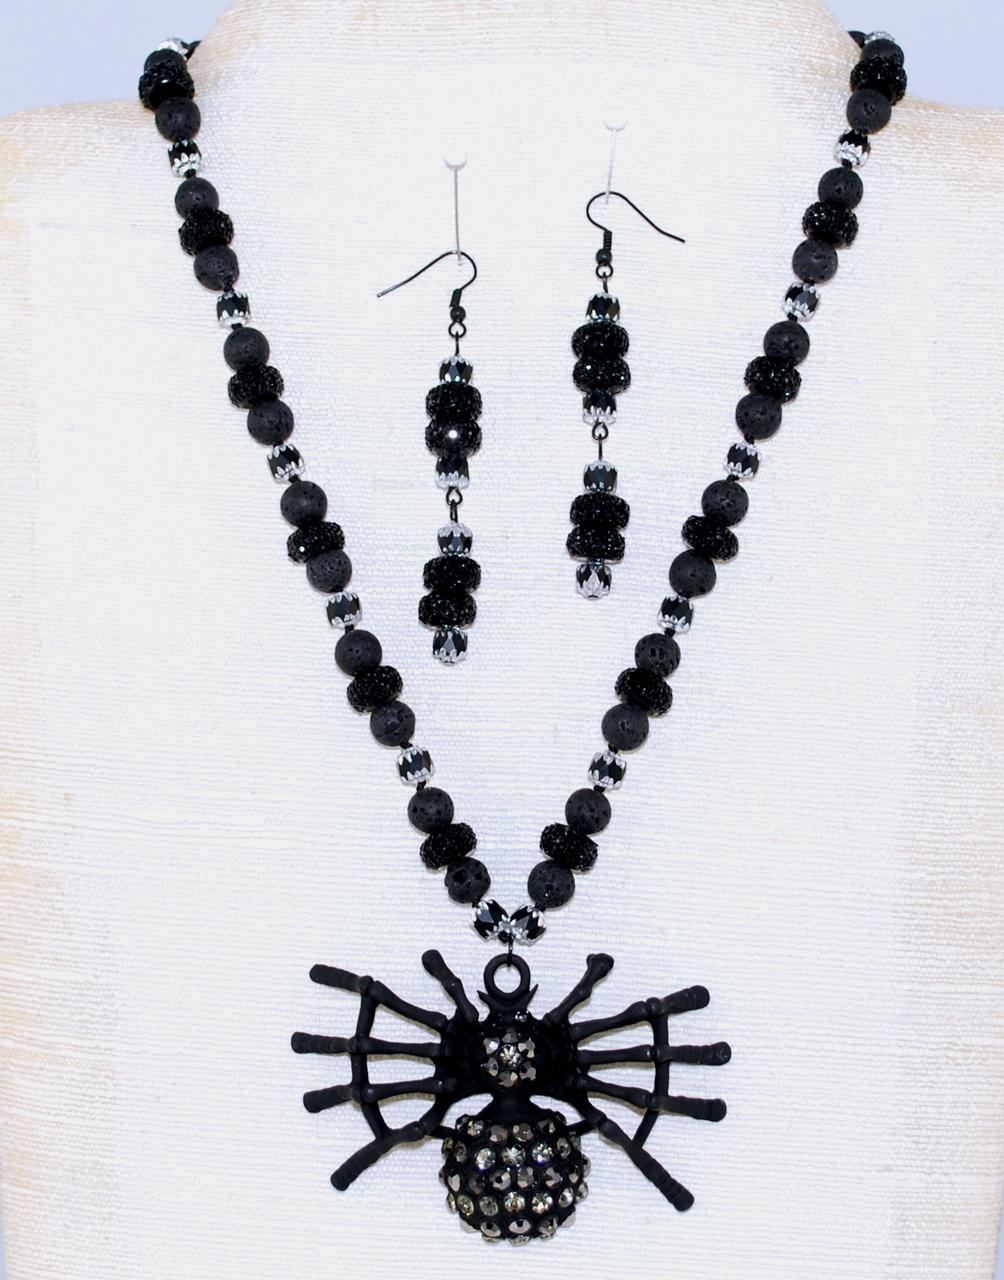 Enchanting Jewelry Creations image 74